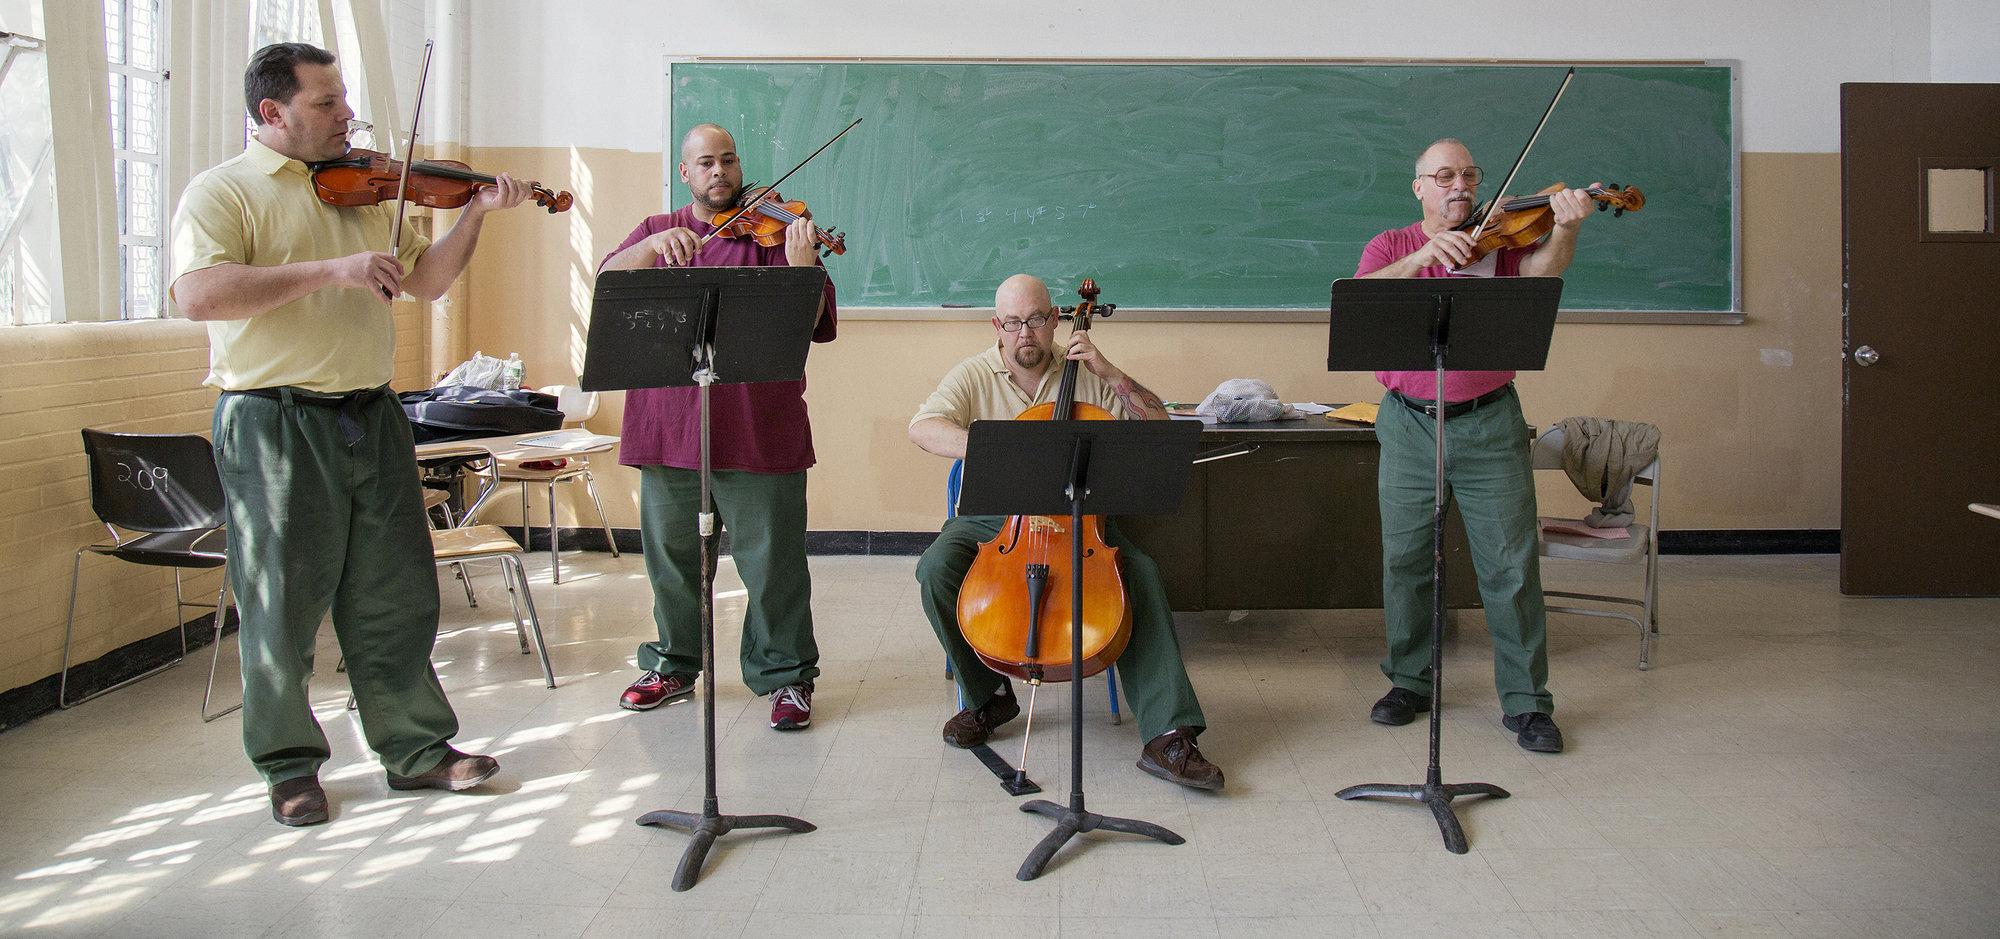 Jason Naradzay, far left, plays violin as part of the Riverside Quartet at Sing Sing Correctional Facility.